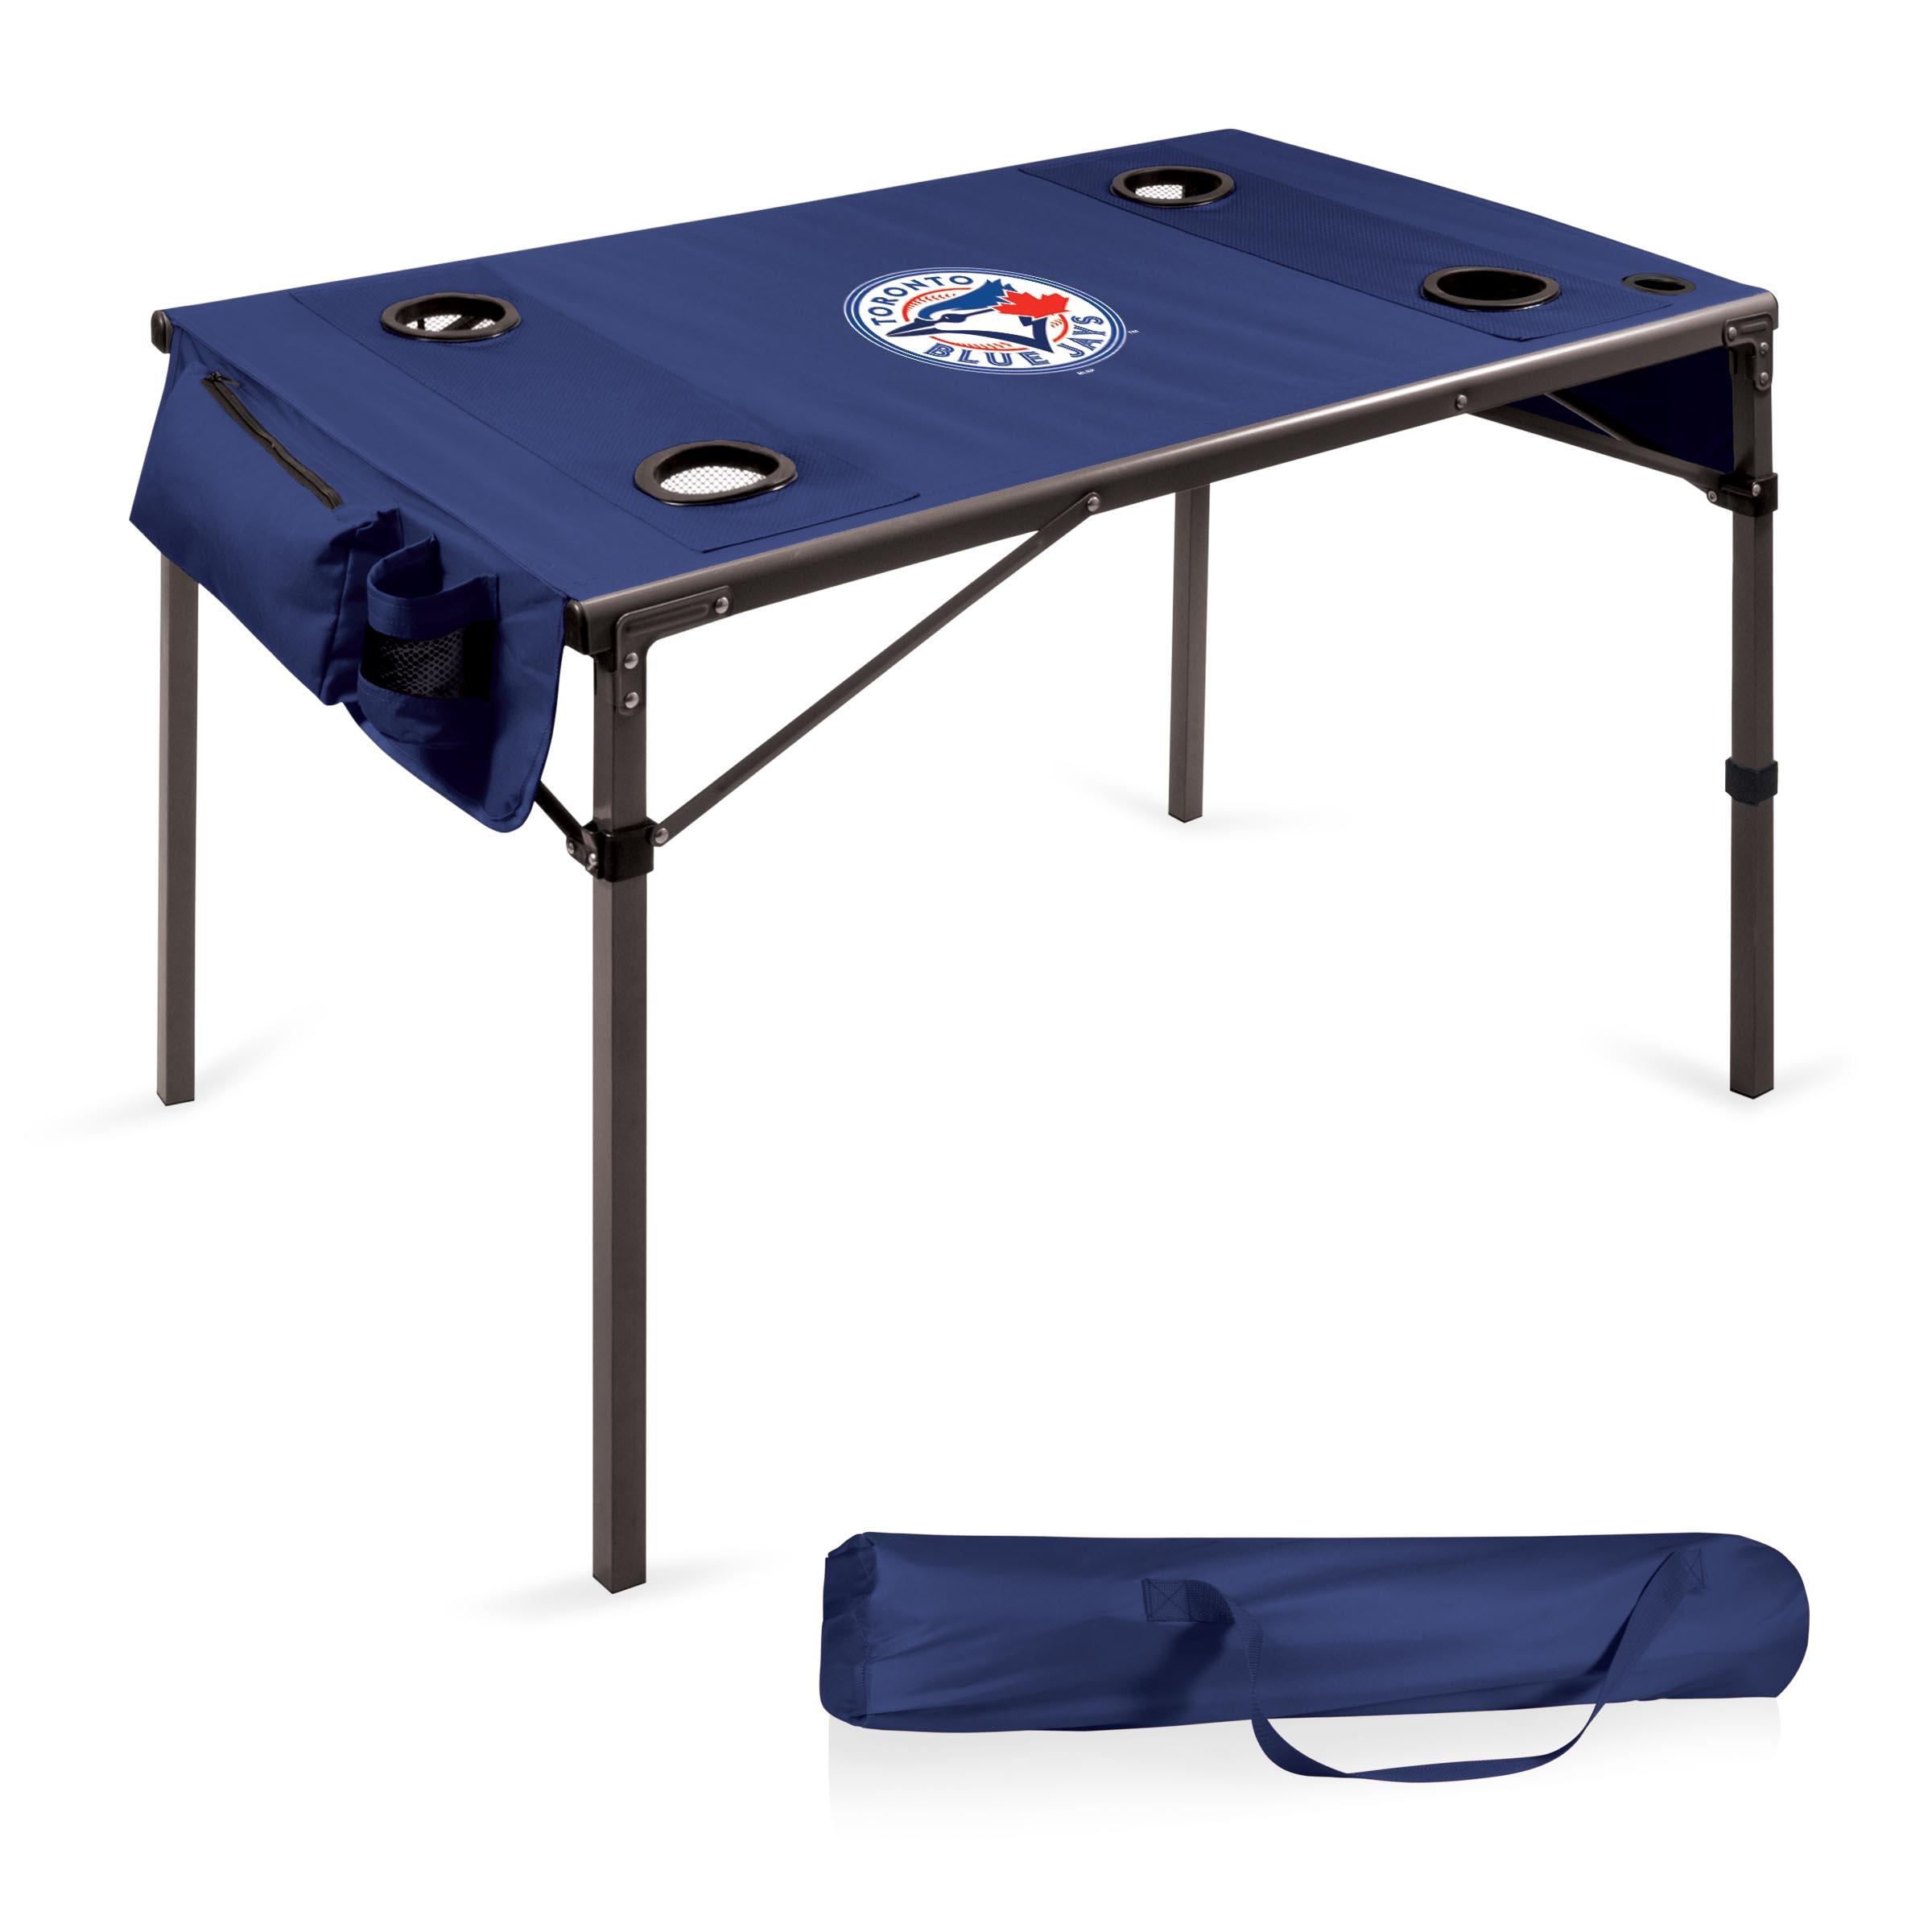 Toronto Blue Jays Portable Folding Travel Table - Navy - No Size